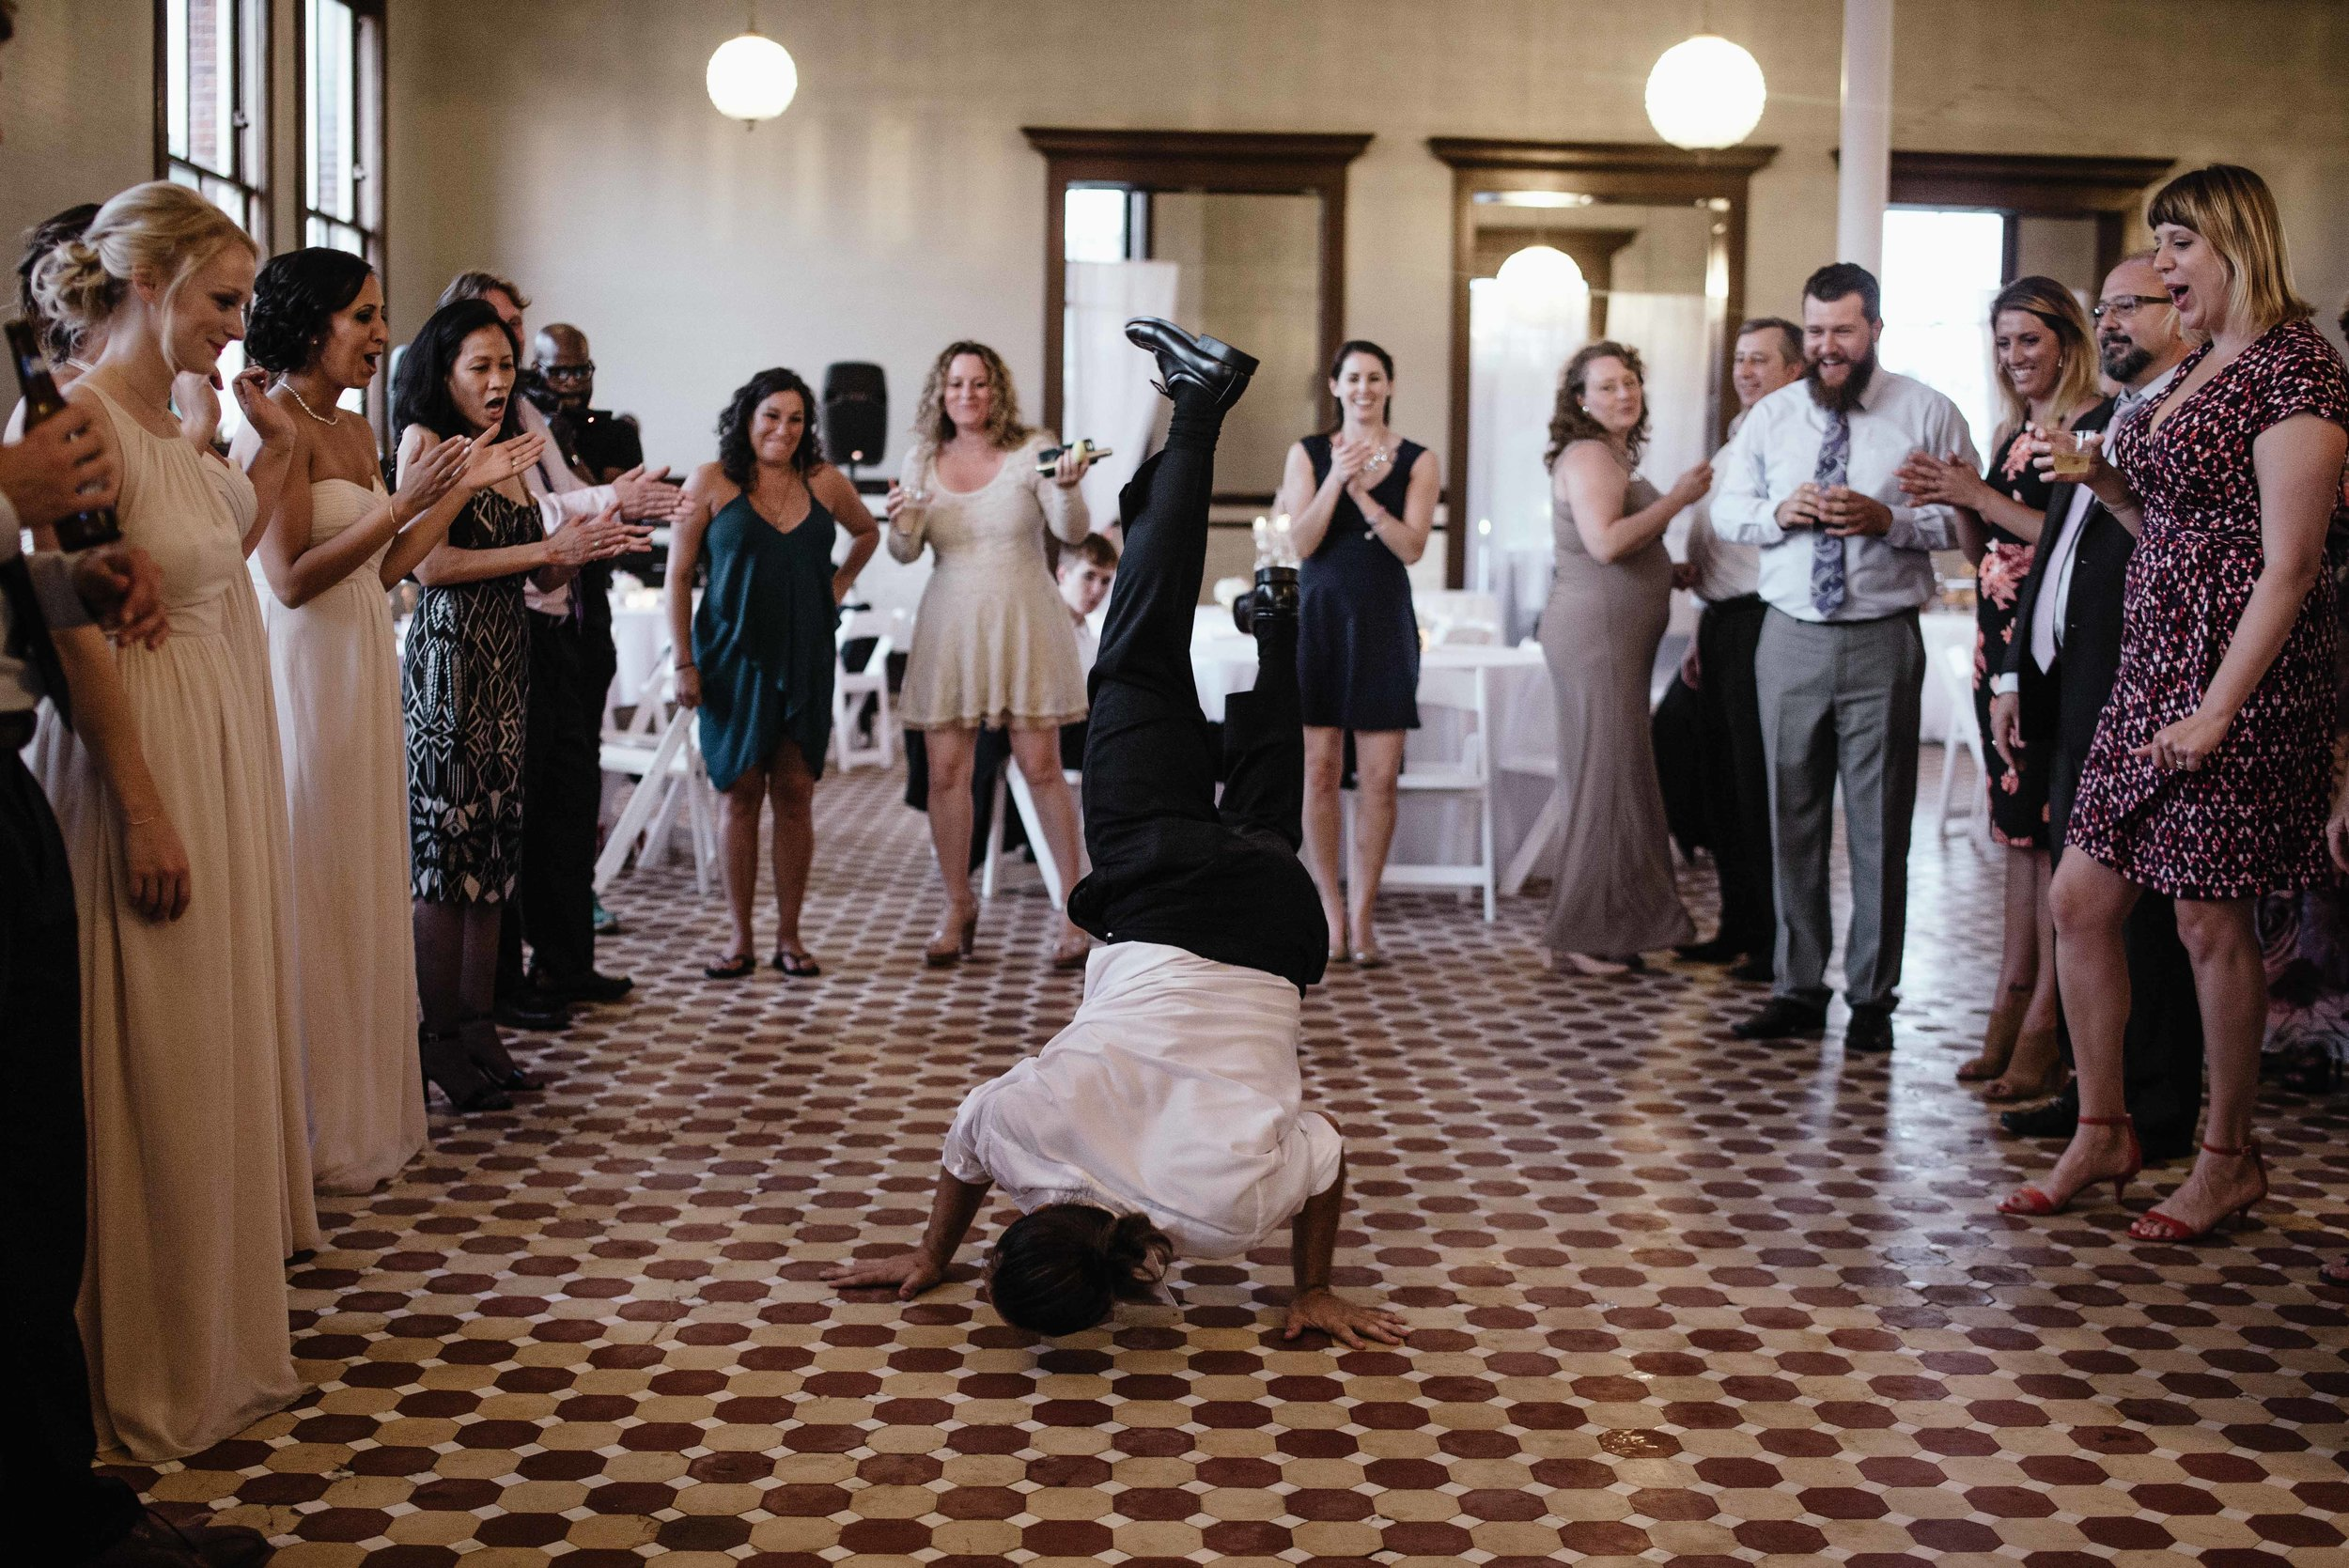 Mina-Steve-Blog-Indianapolis-Wedding-177.jpg